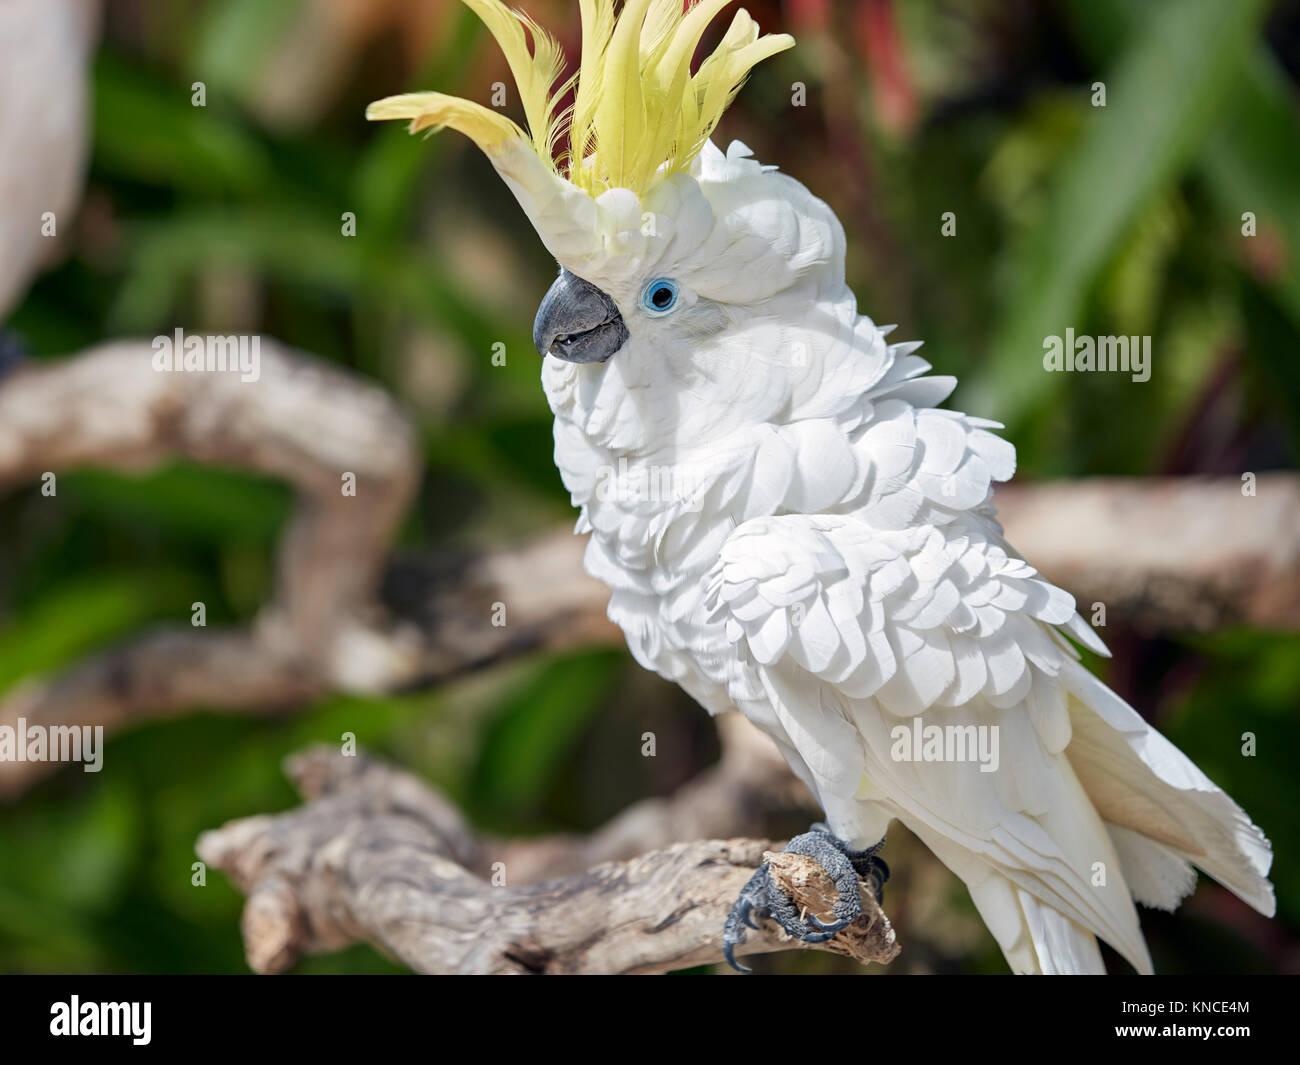 The Sulphur-Crested Cockatoo (Cacatua galerita). Bali Bird Park, Batubulan, Gianyar regency, Bali, Indonesia. - Stock Image